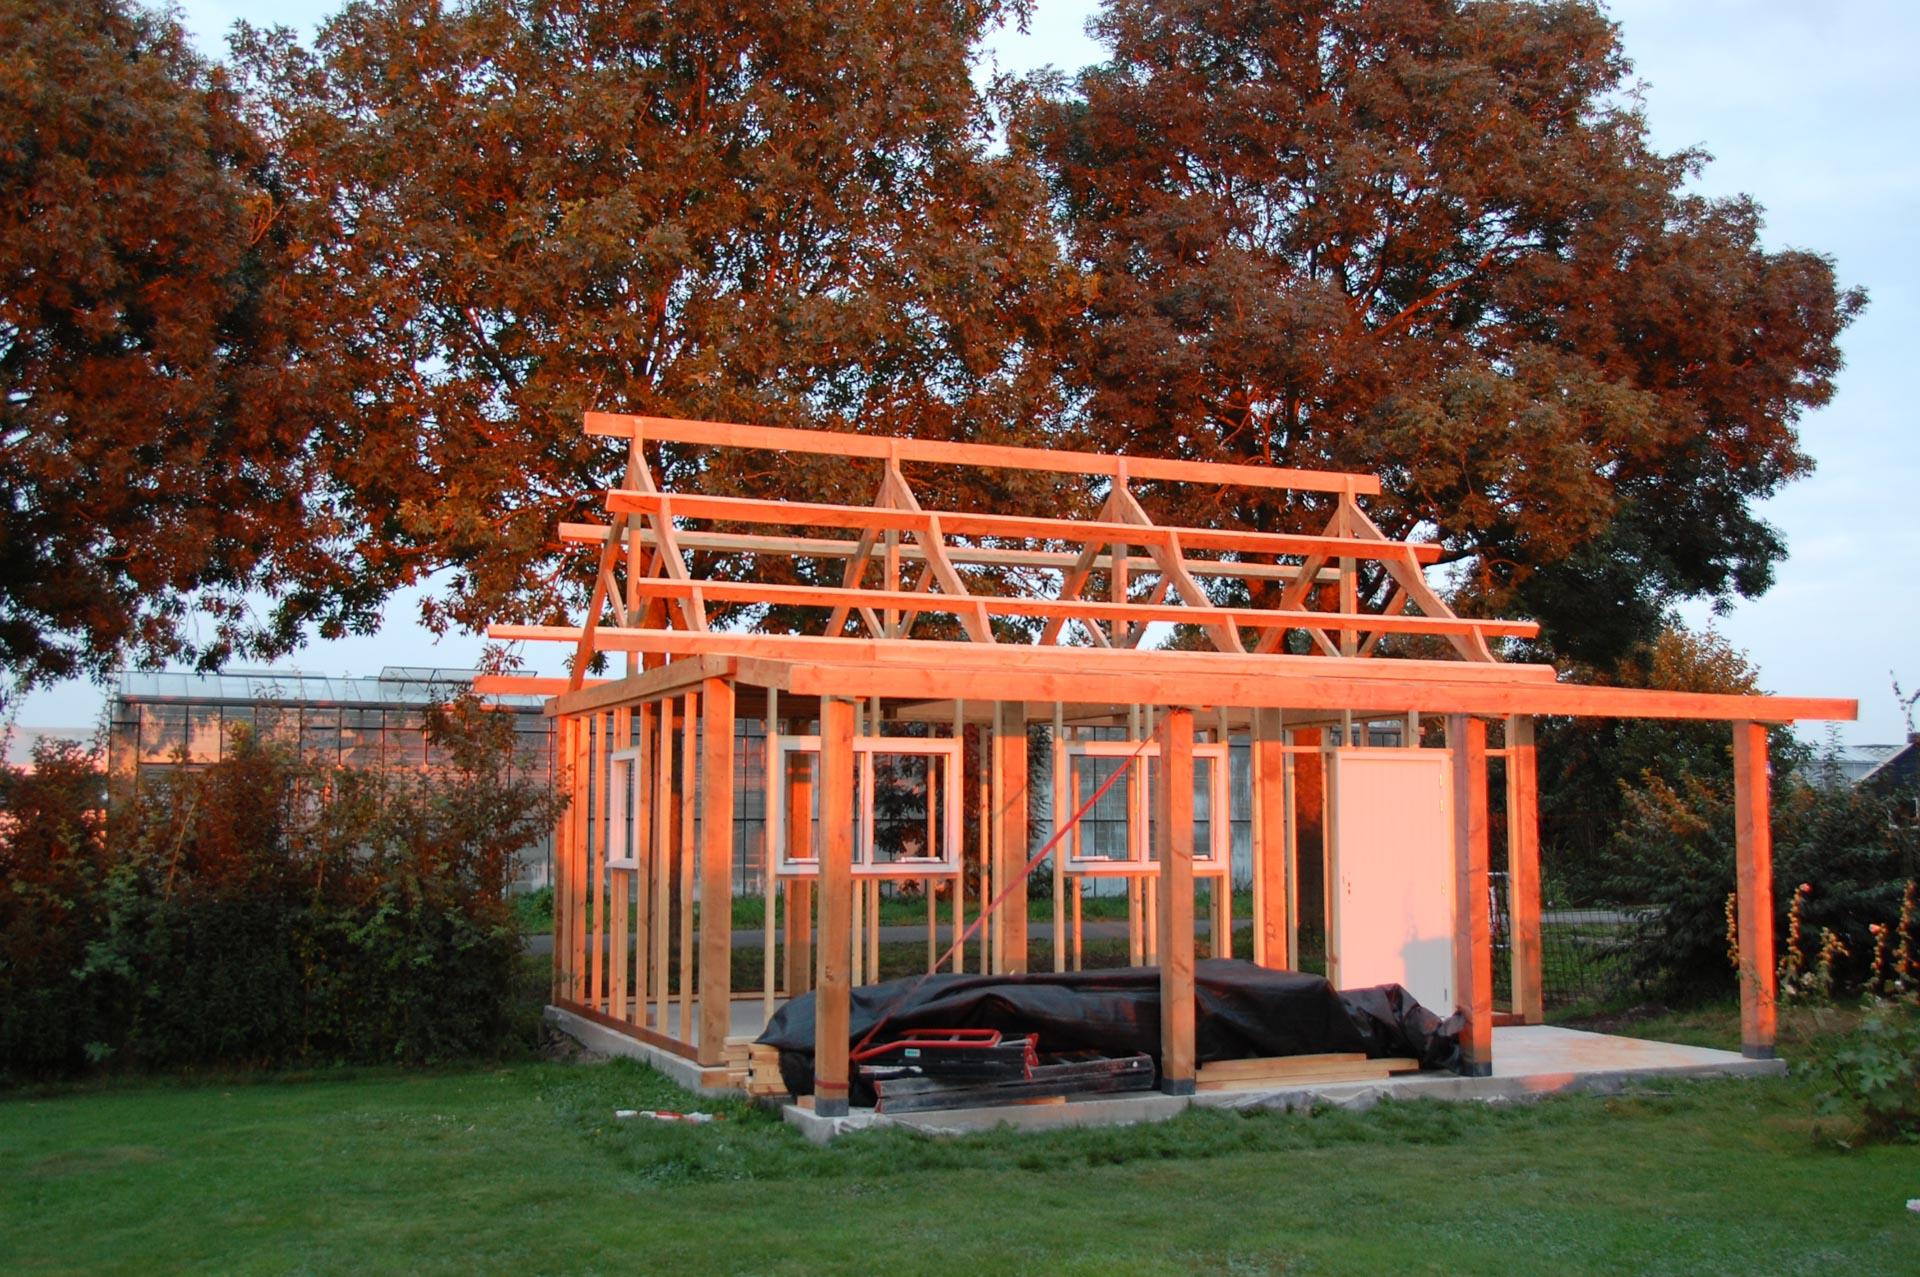 vos-hoveniers-project-tuinhuis-12